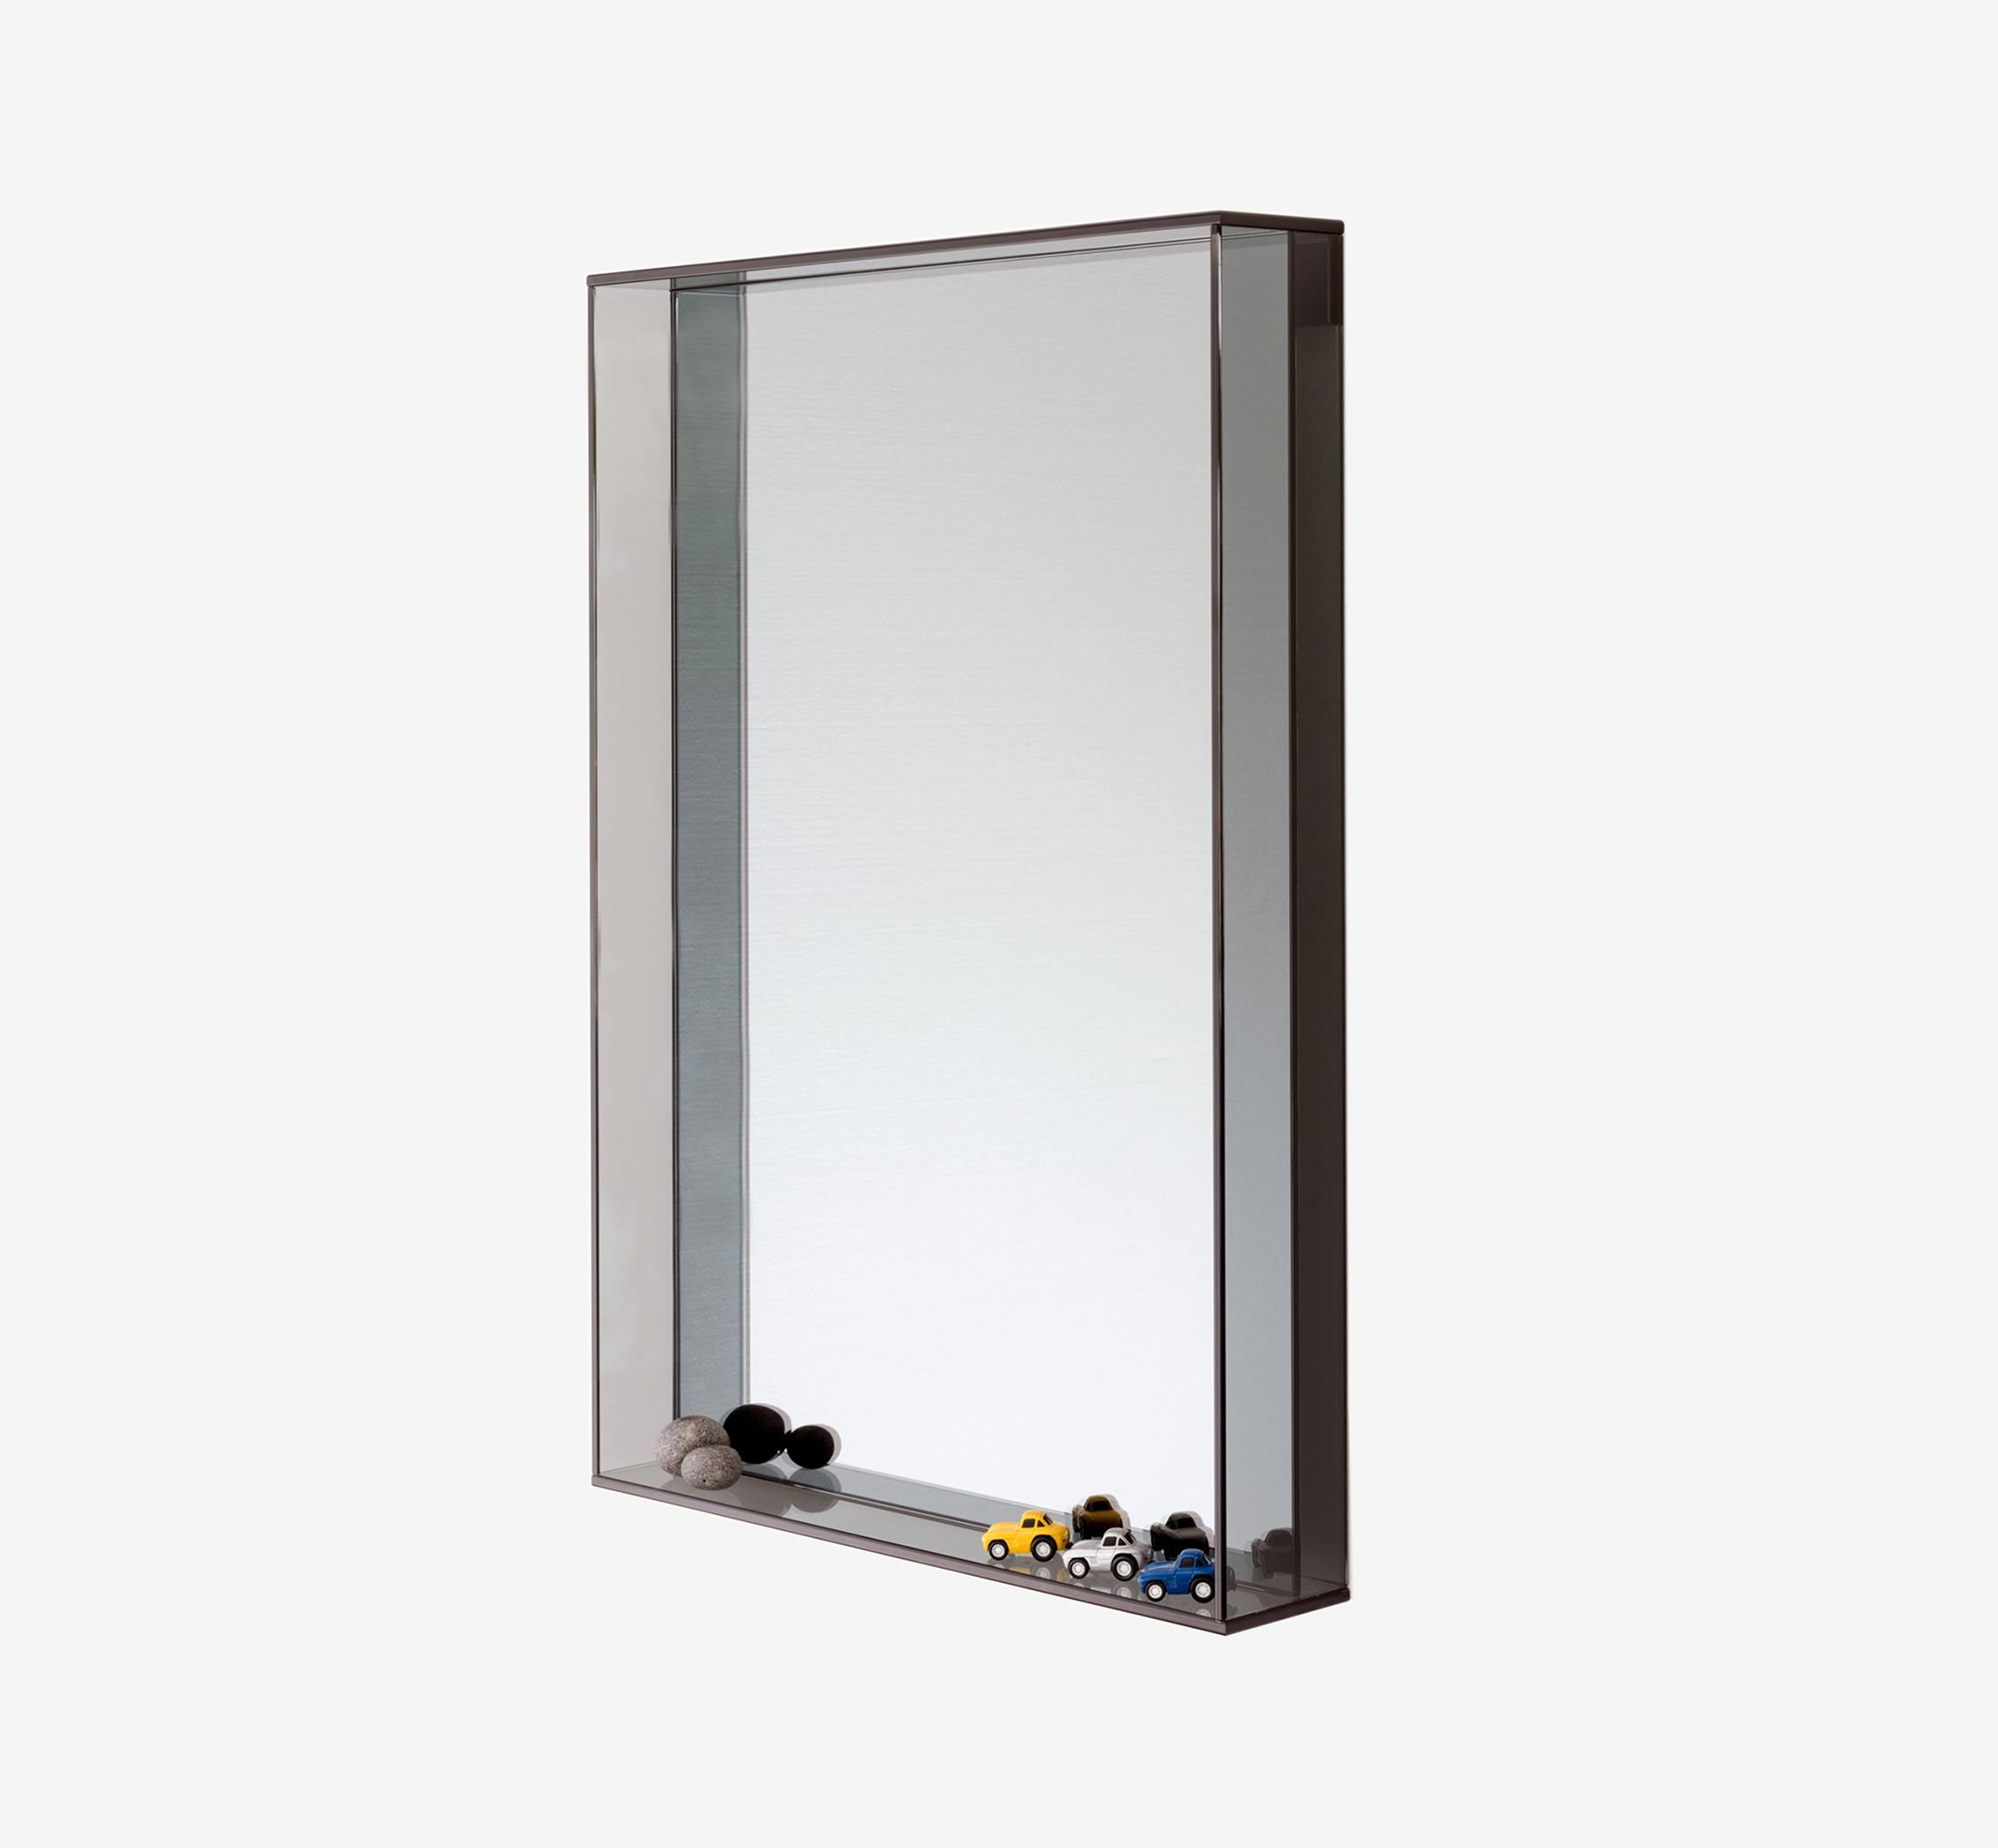 Large Glass Ideas Home Wall Black Oval Argos Furniture Regarding Thornbury Oval Bevel Frameless Wall Mirrors (Image 9 of 20)